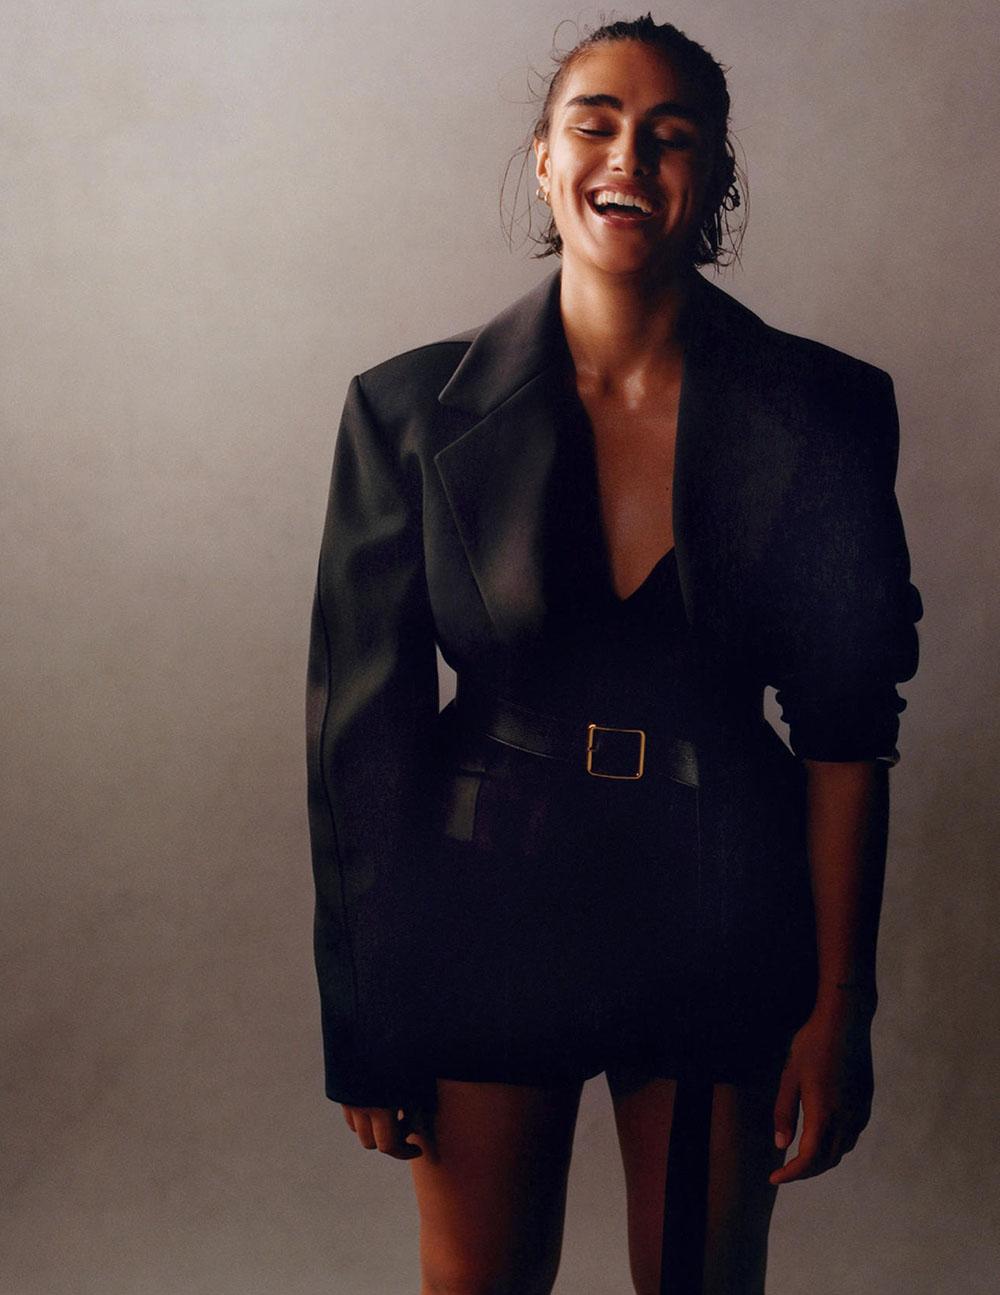 Jill Kortleve covers Vogue Netherlands October 2019 by Scott Trindle